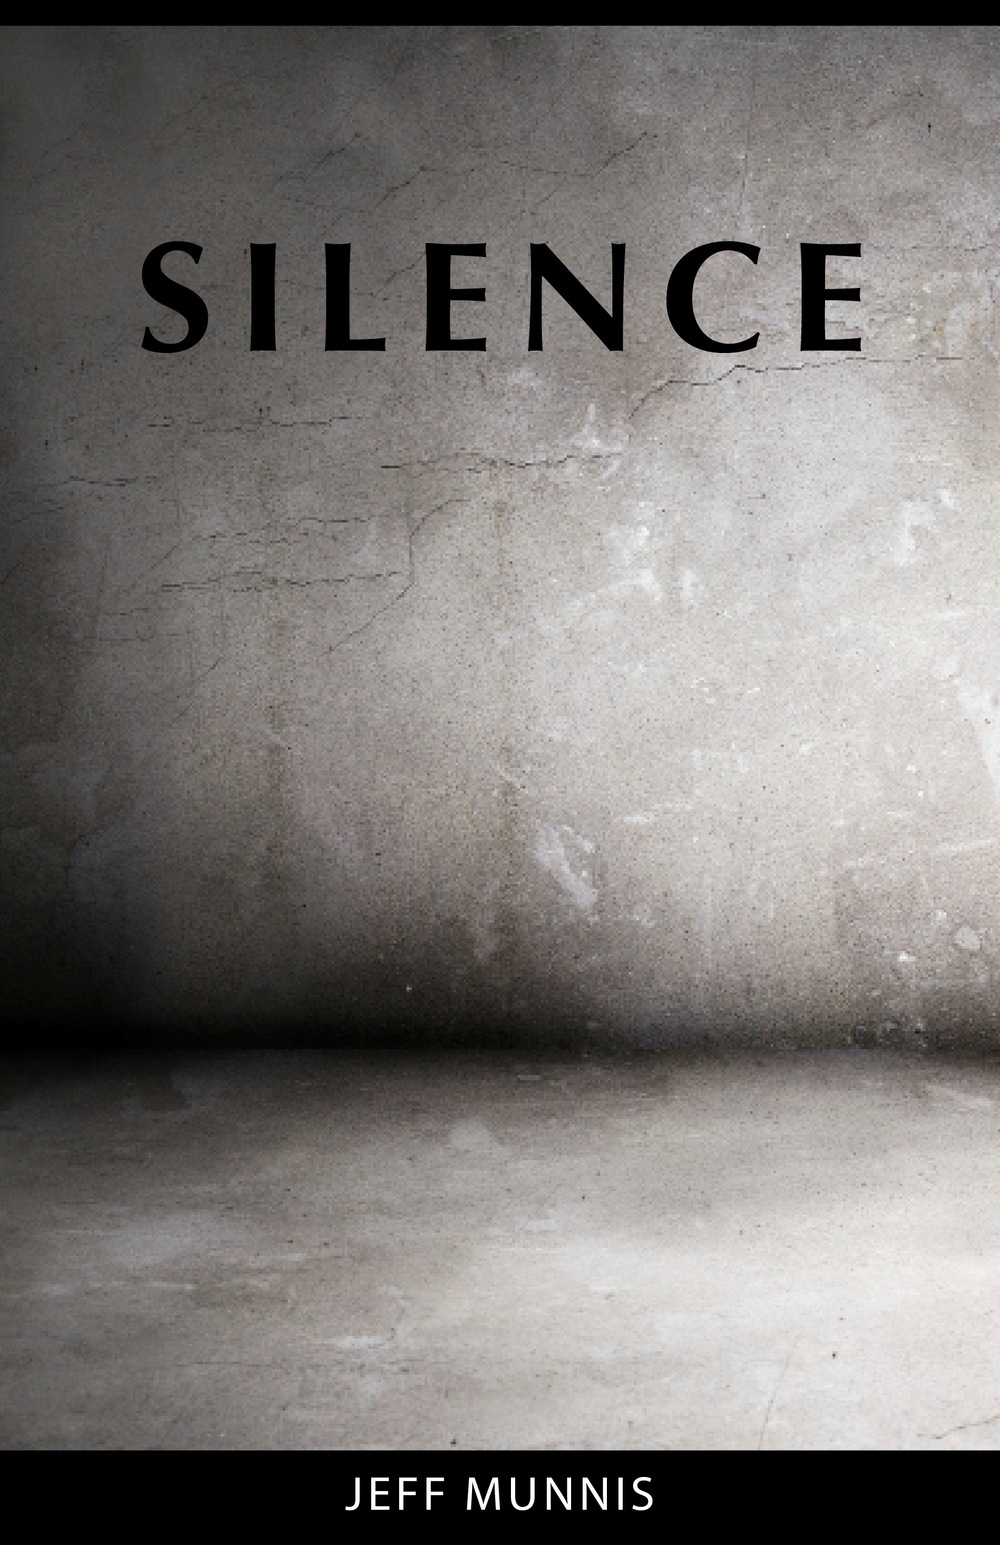 Silence cover small.jpg